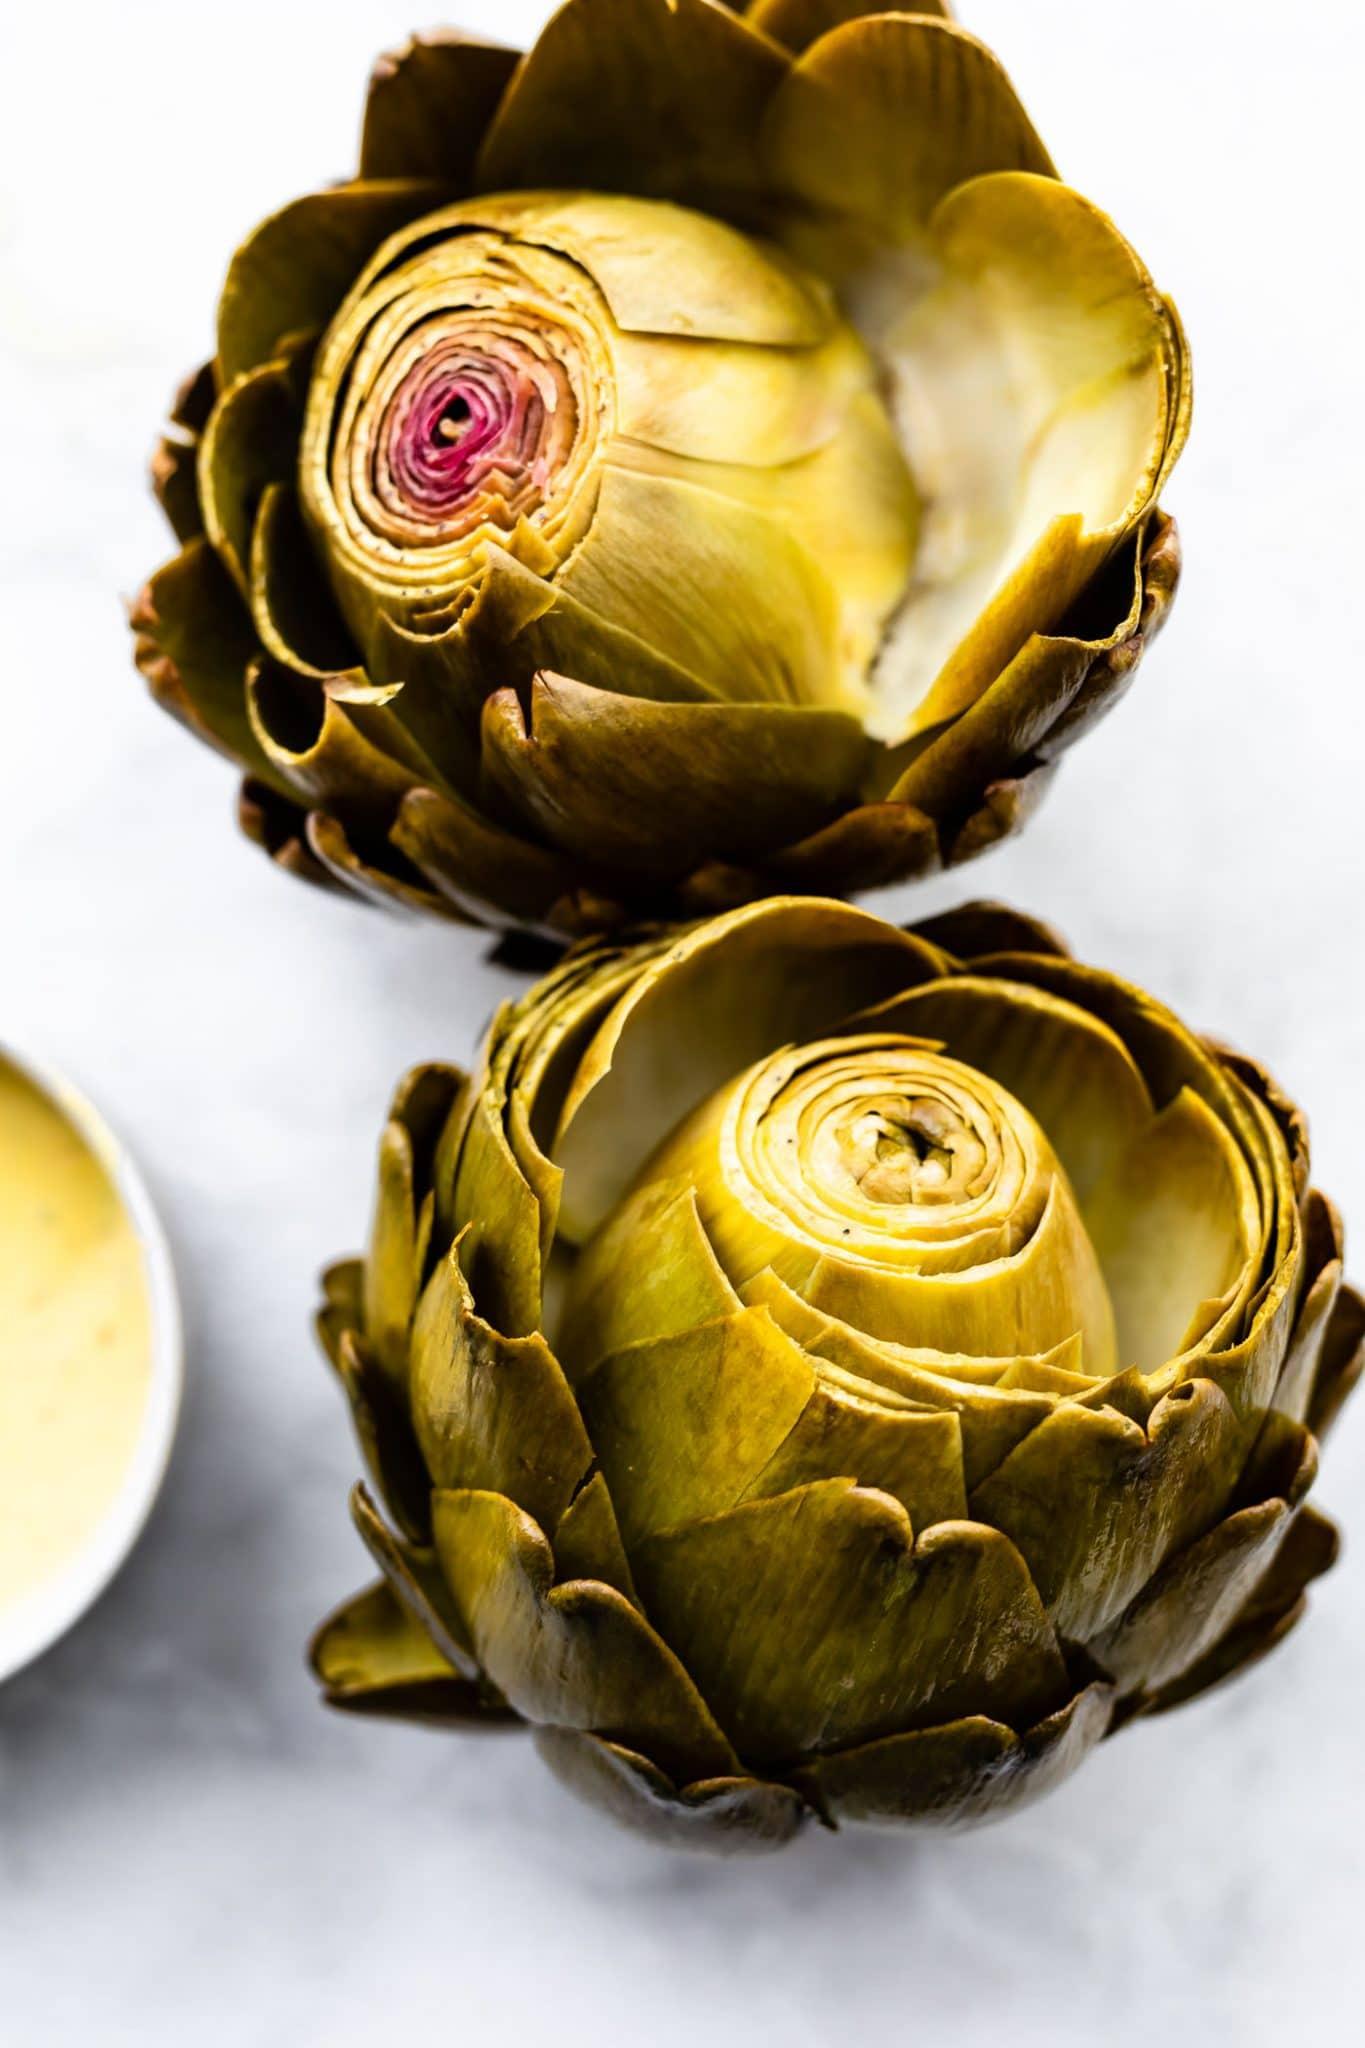 A close up image of prepared fresh artichokes with a side dish of garlic aioli.